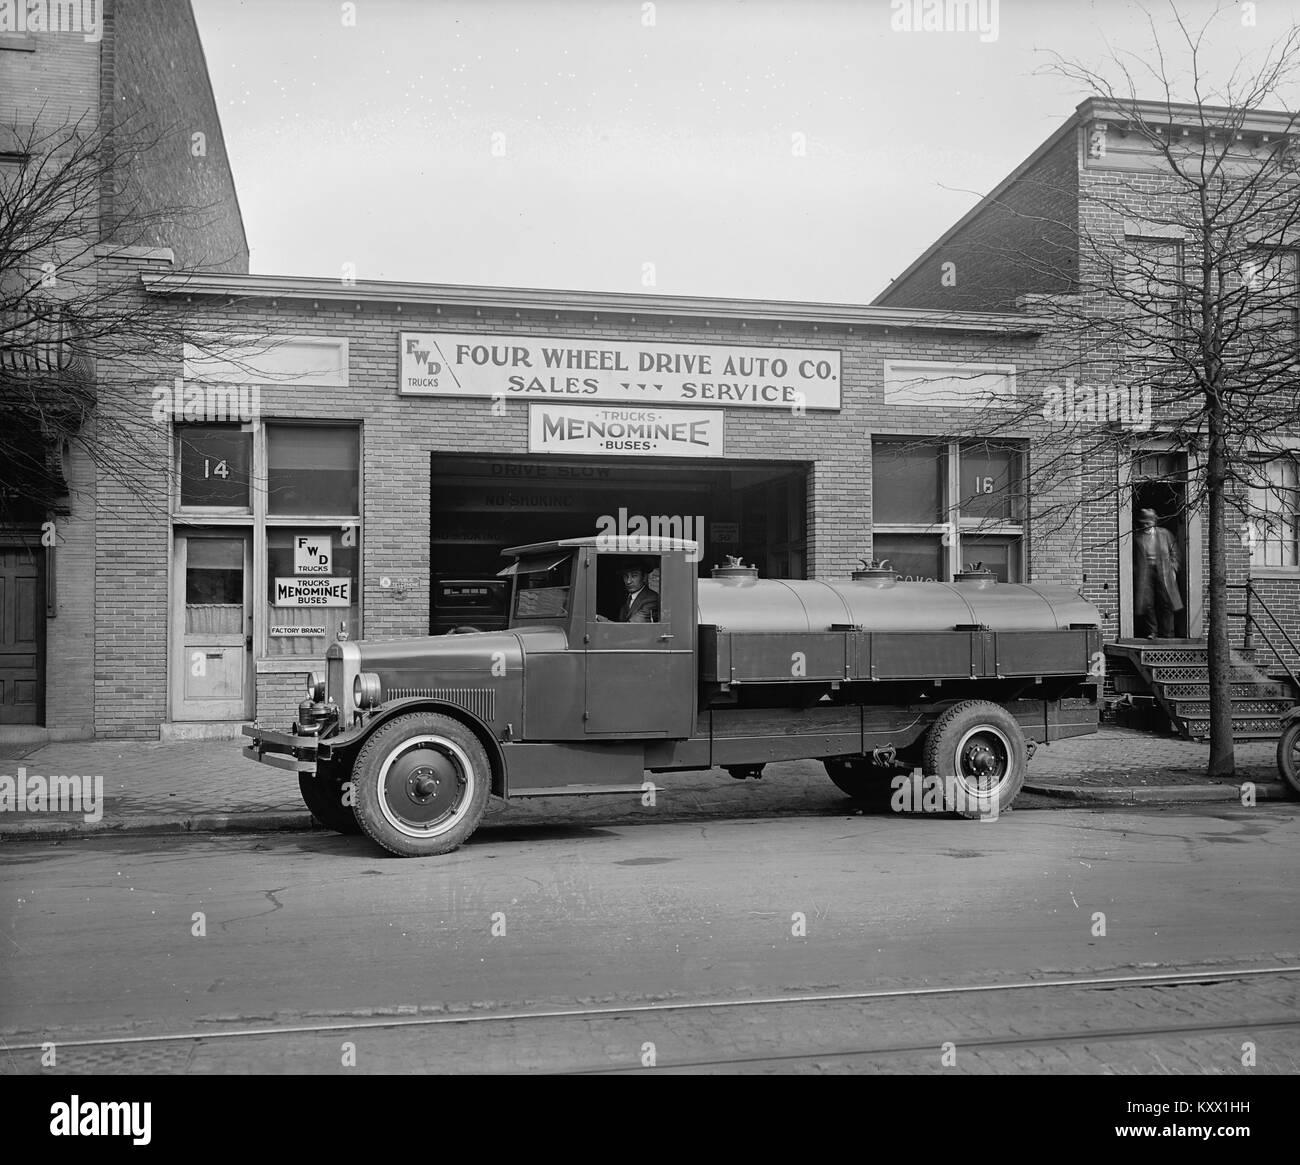 Fuel Truck - Stock Image